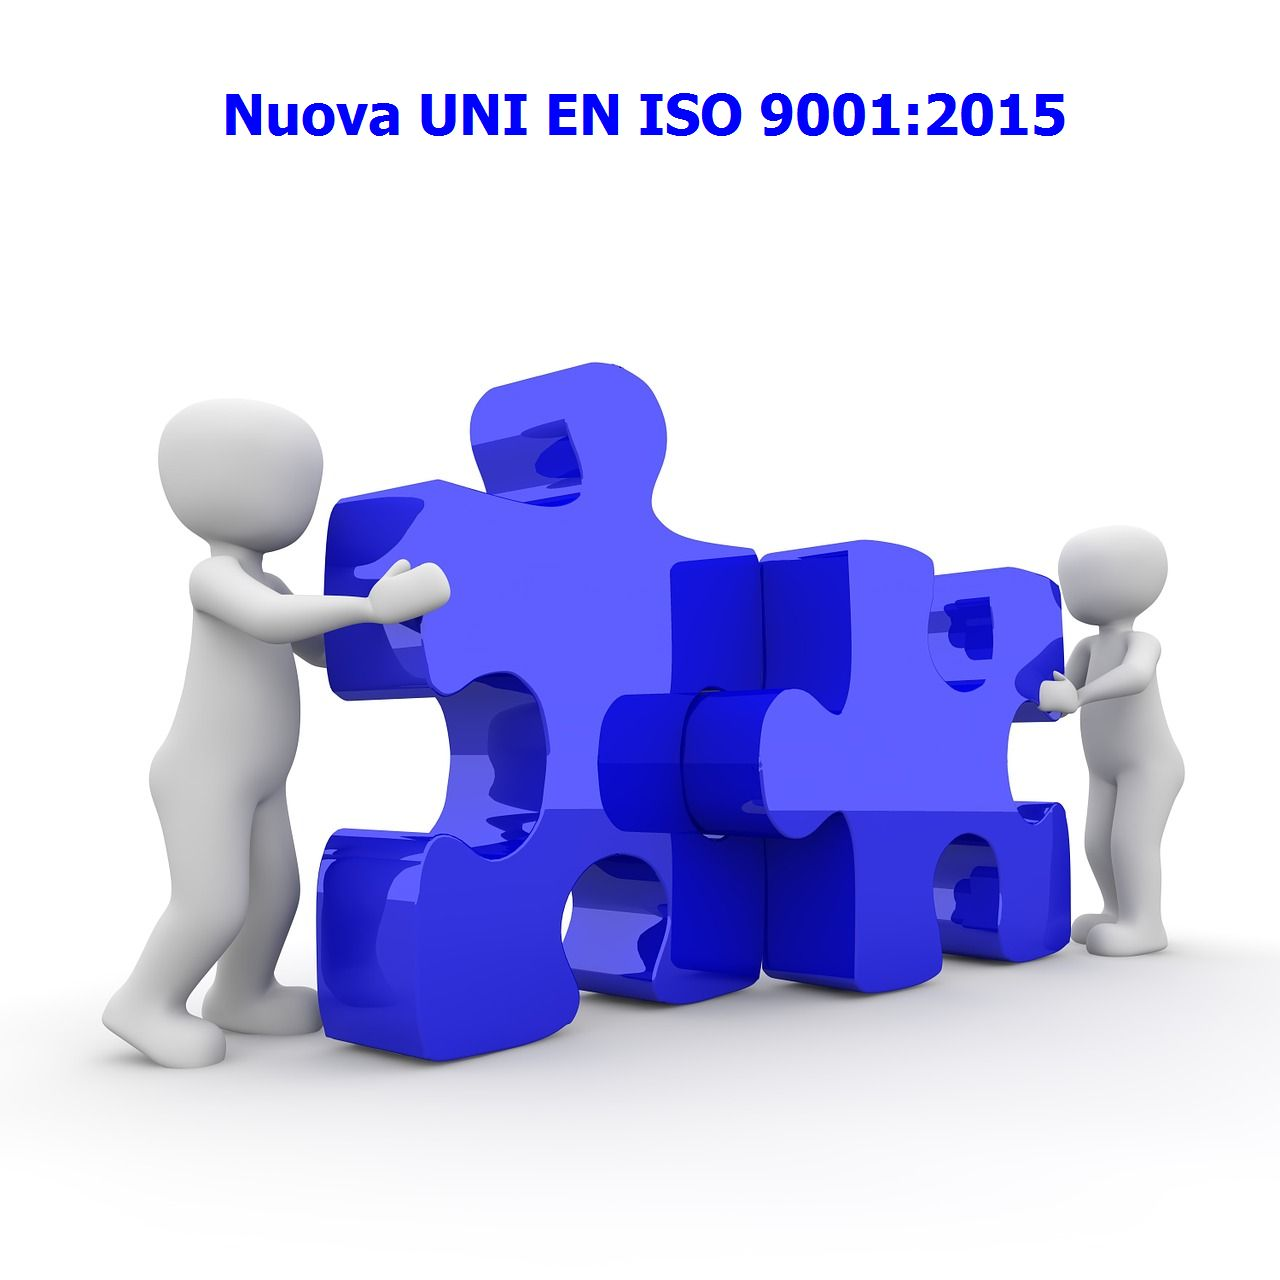 UNI 9001